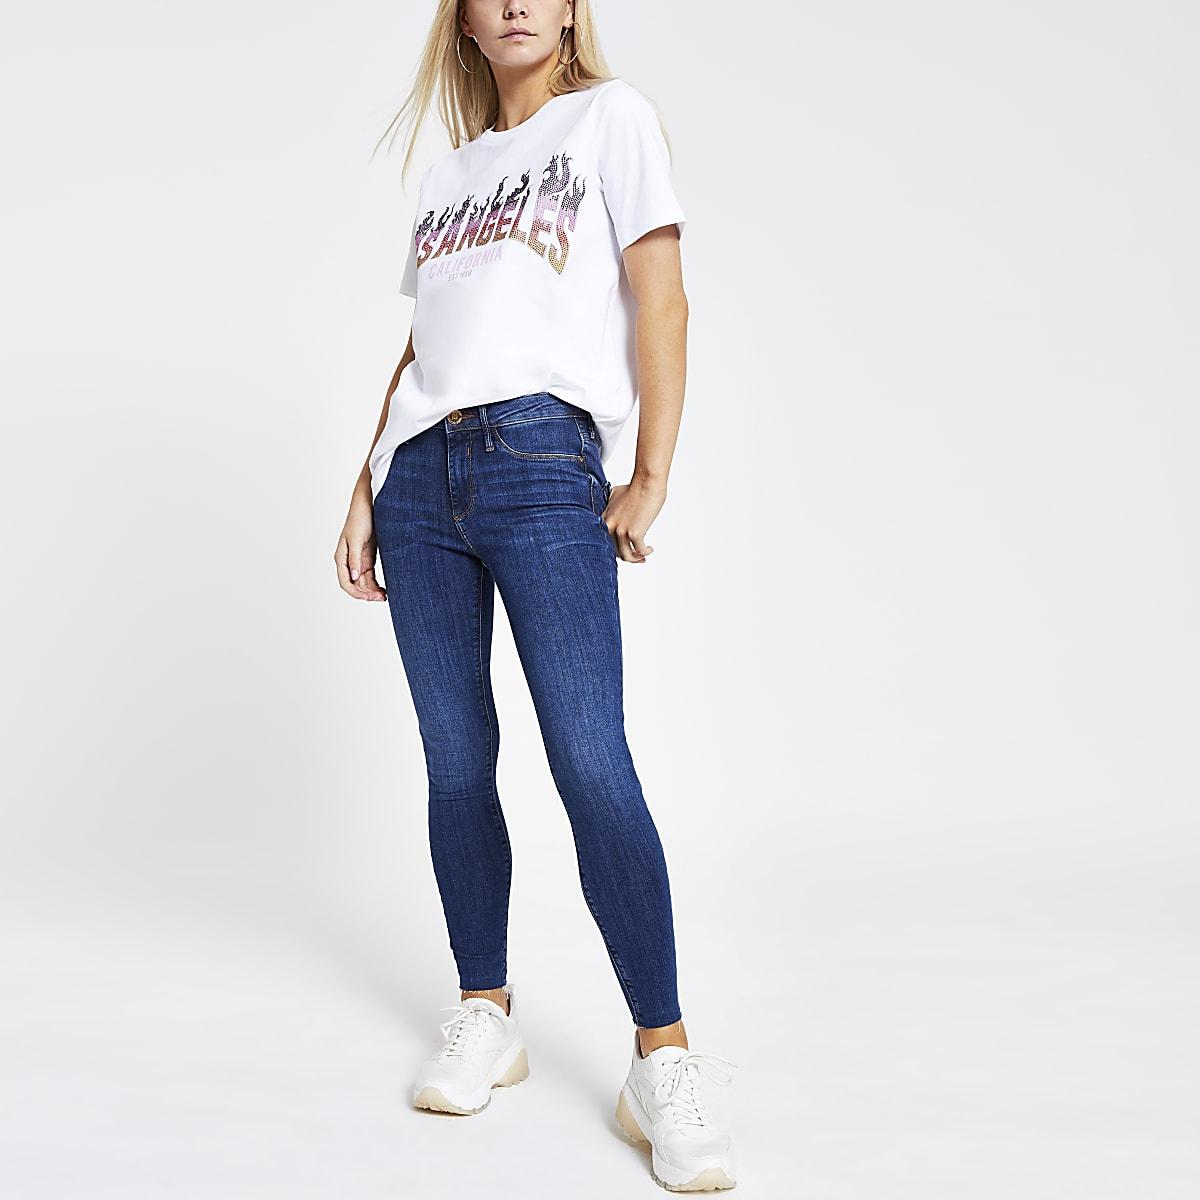 Wit T-shirt met 'Los Angeles'-print en pailletten